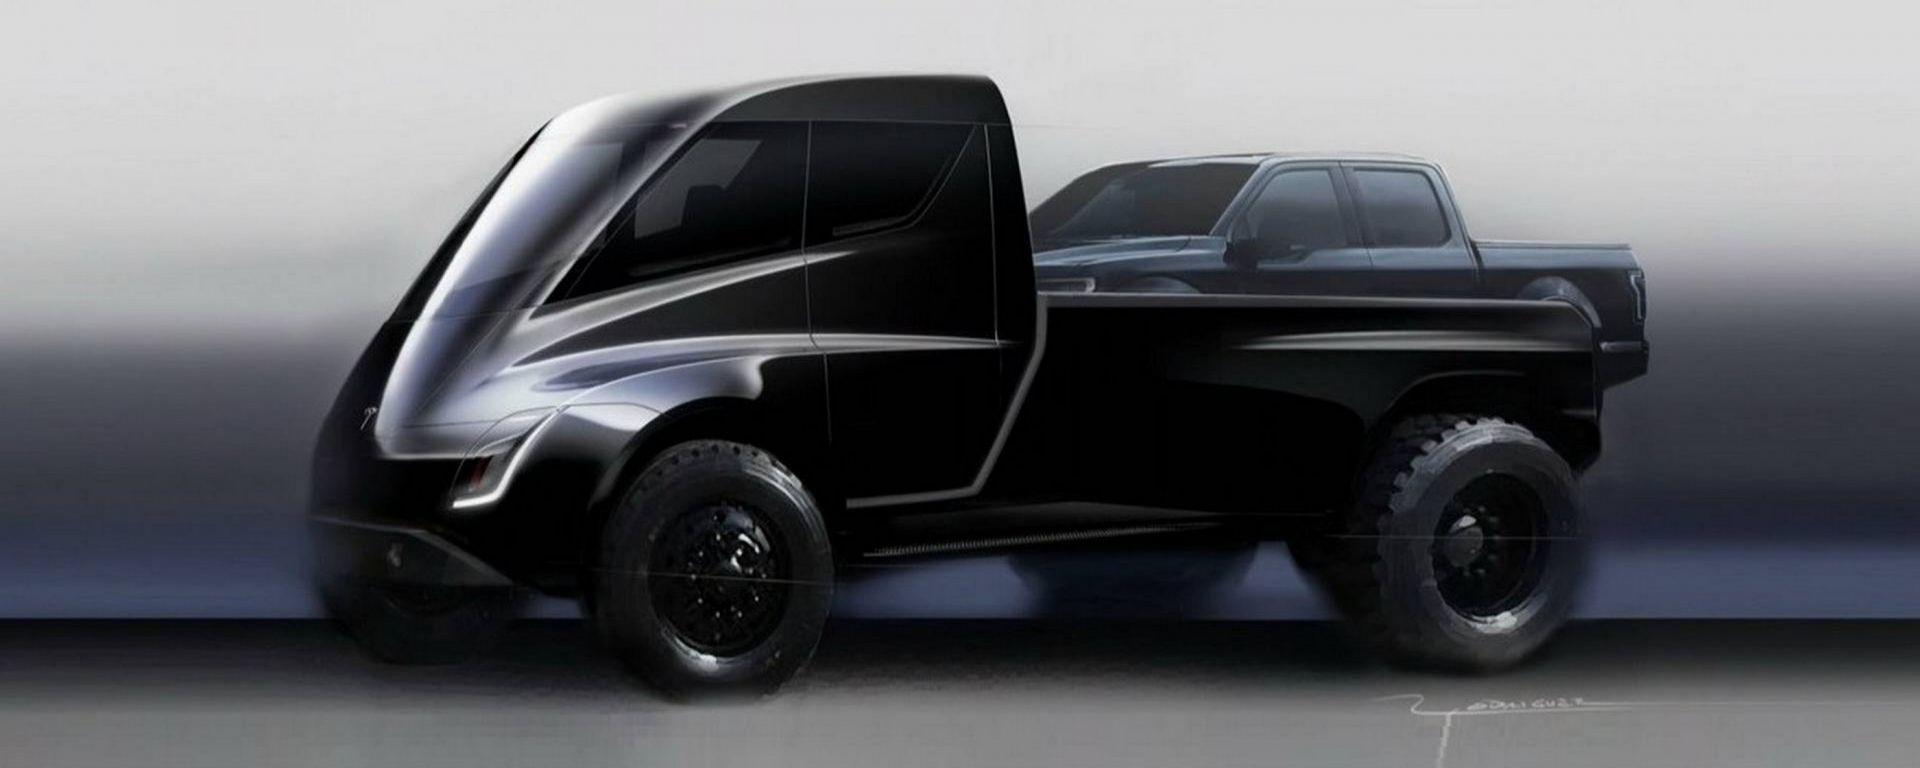 Tesla pick up: a sorpresa tra Roadster e Semi Truck